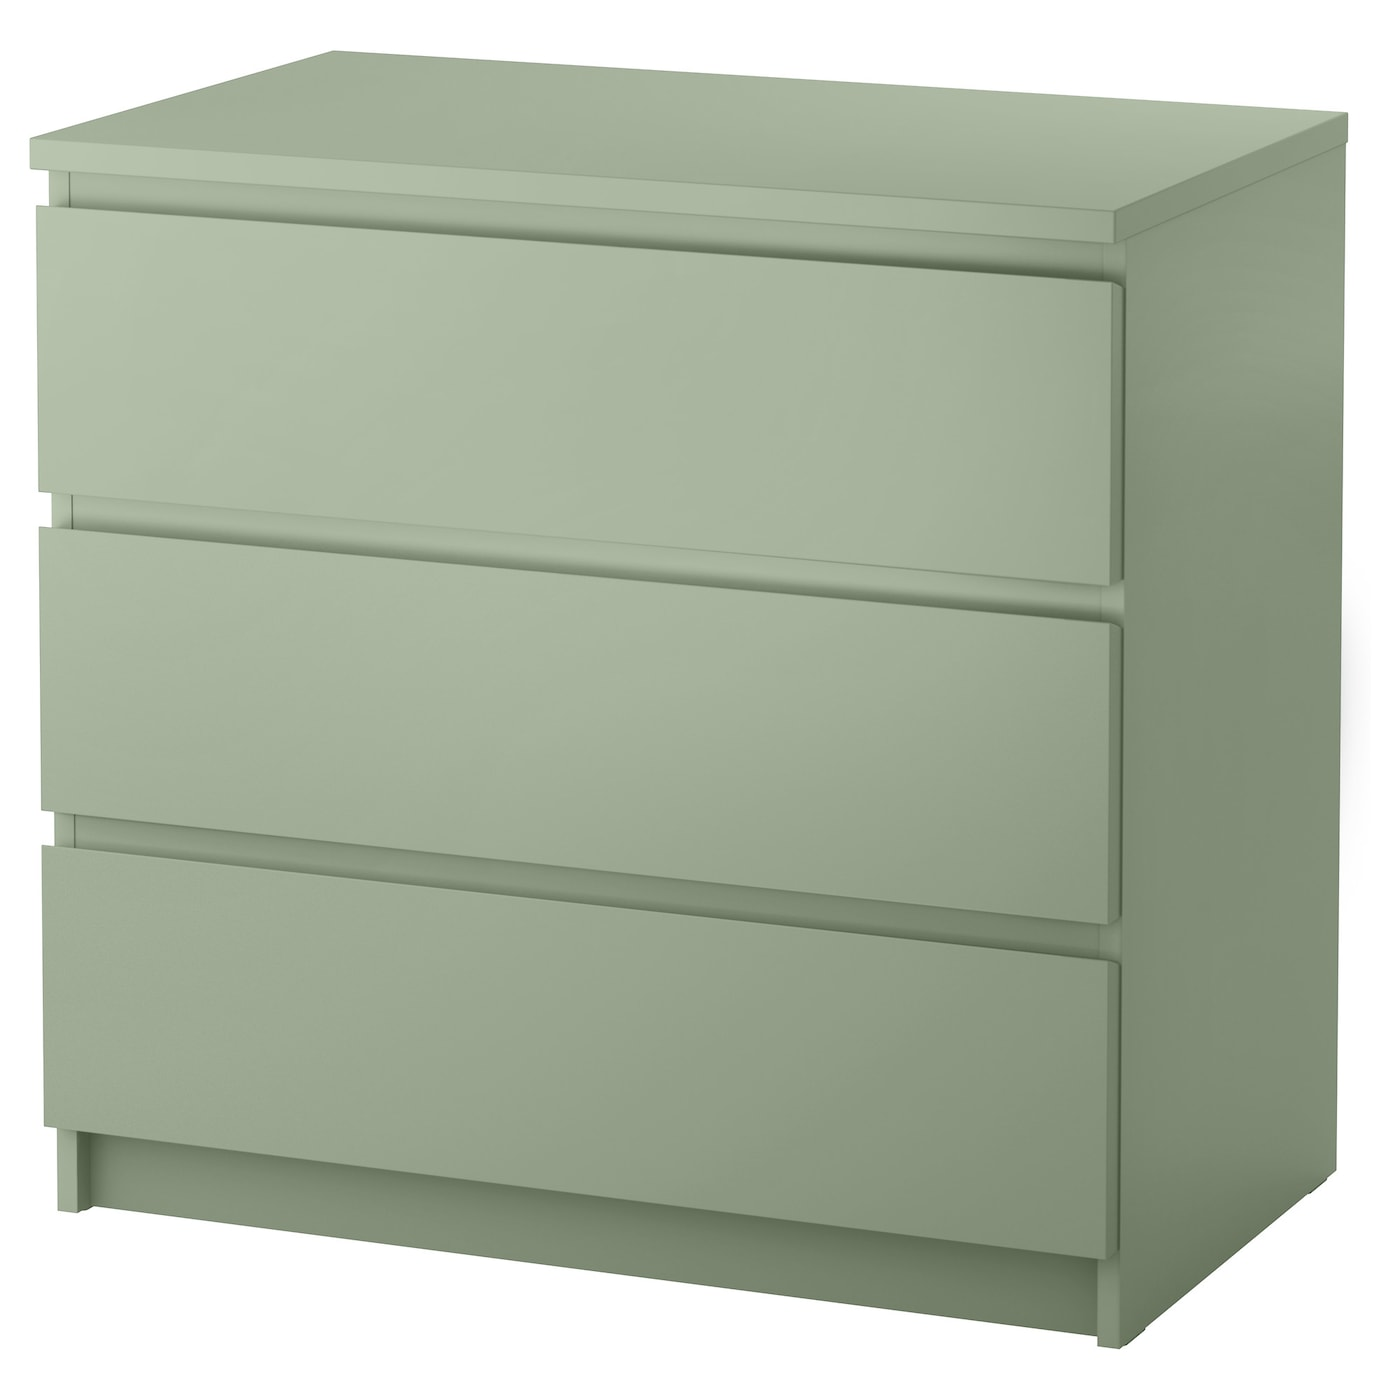 MALM Ladekast 3 lades Lichtgroen 80x78 cm - IKEA